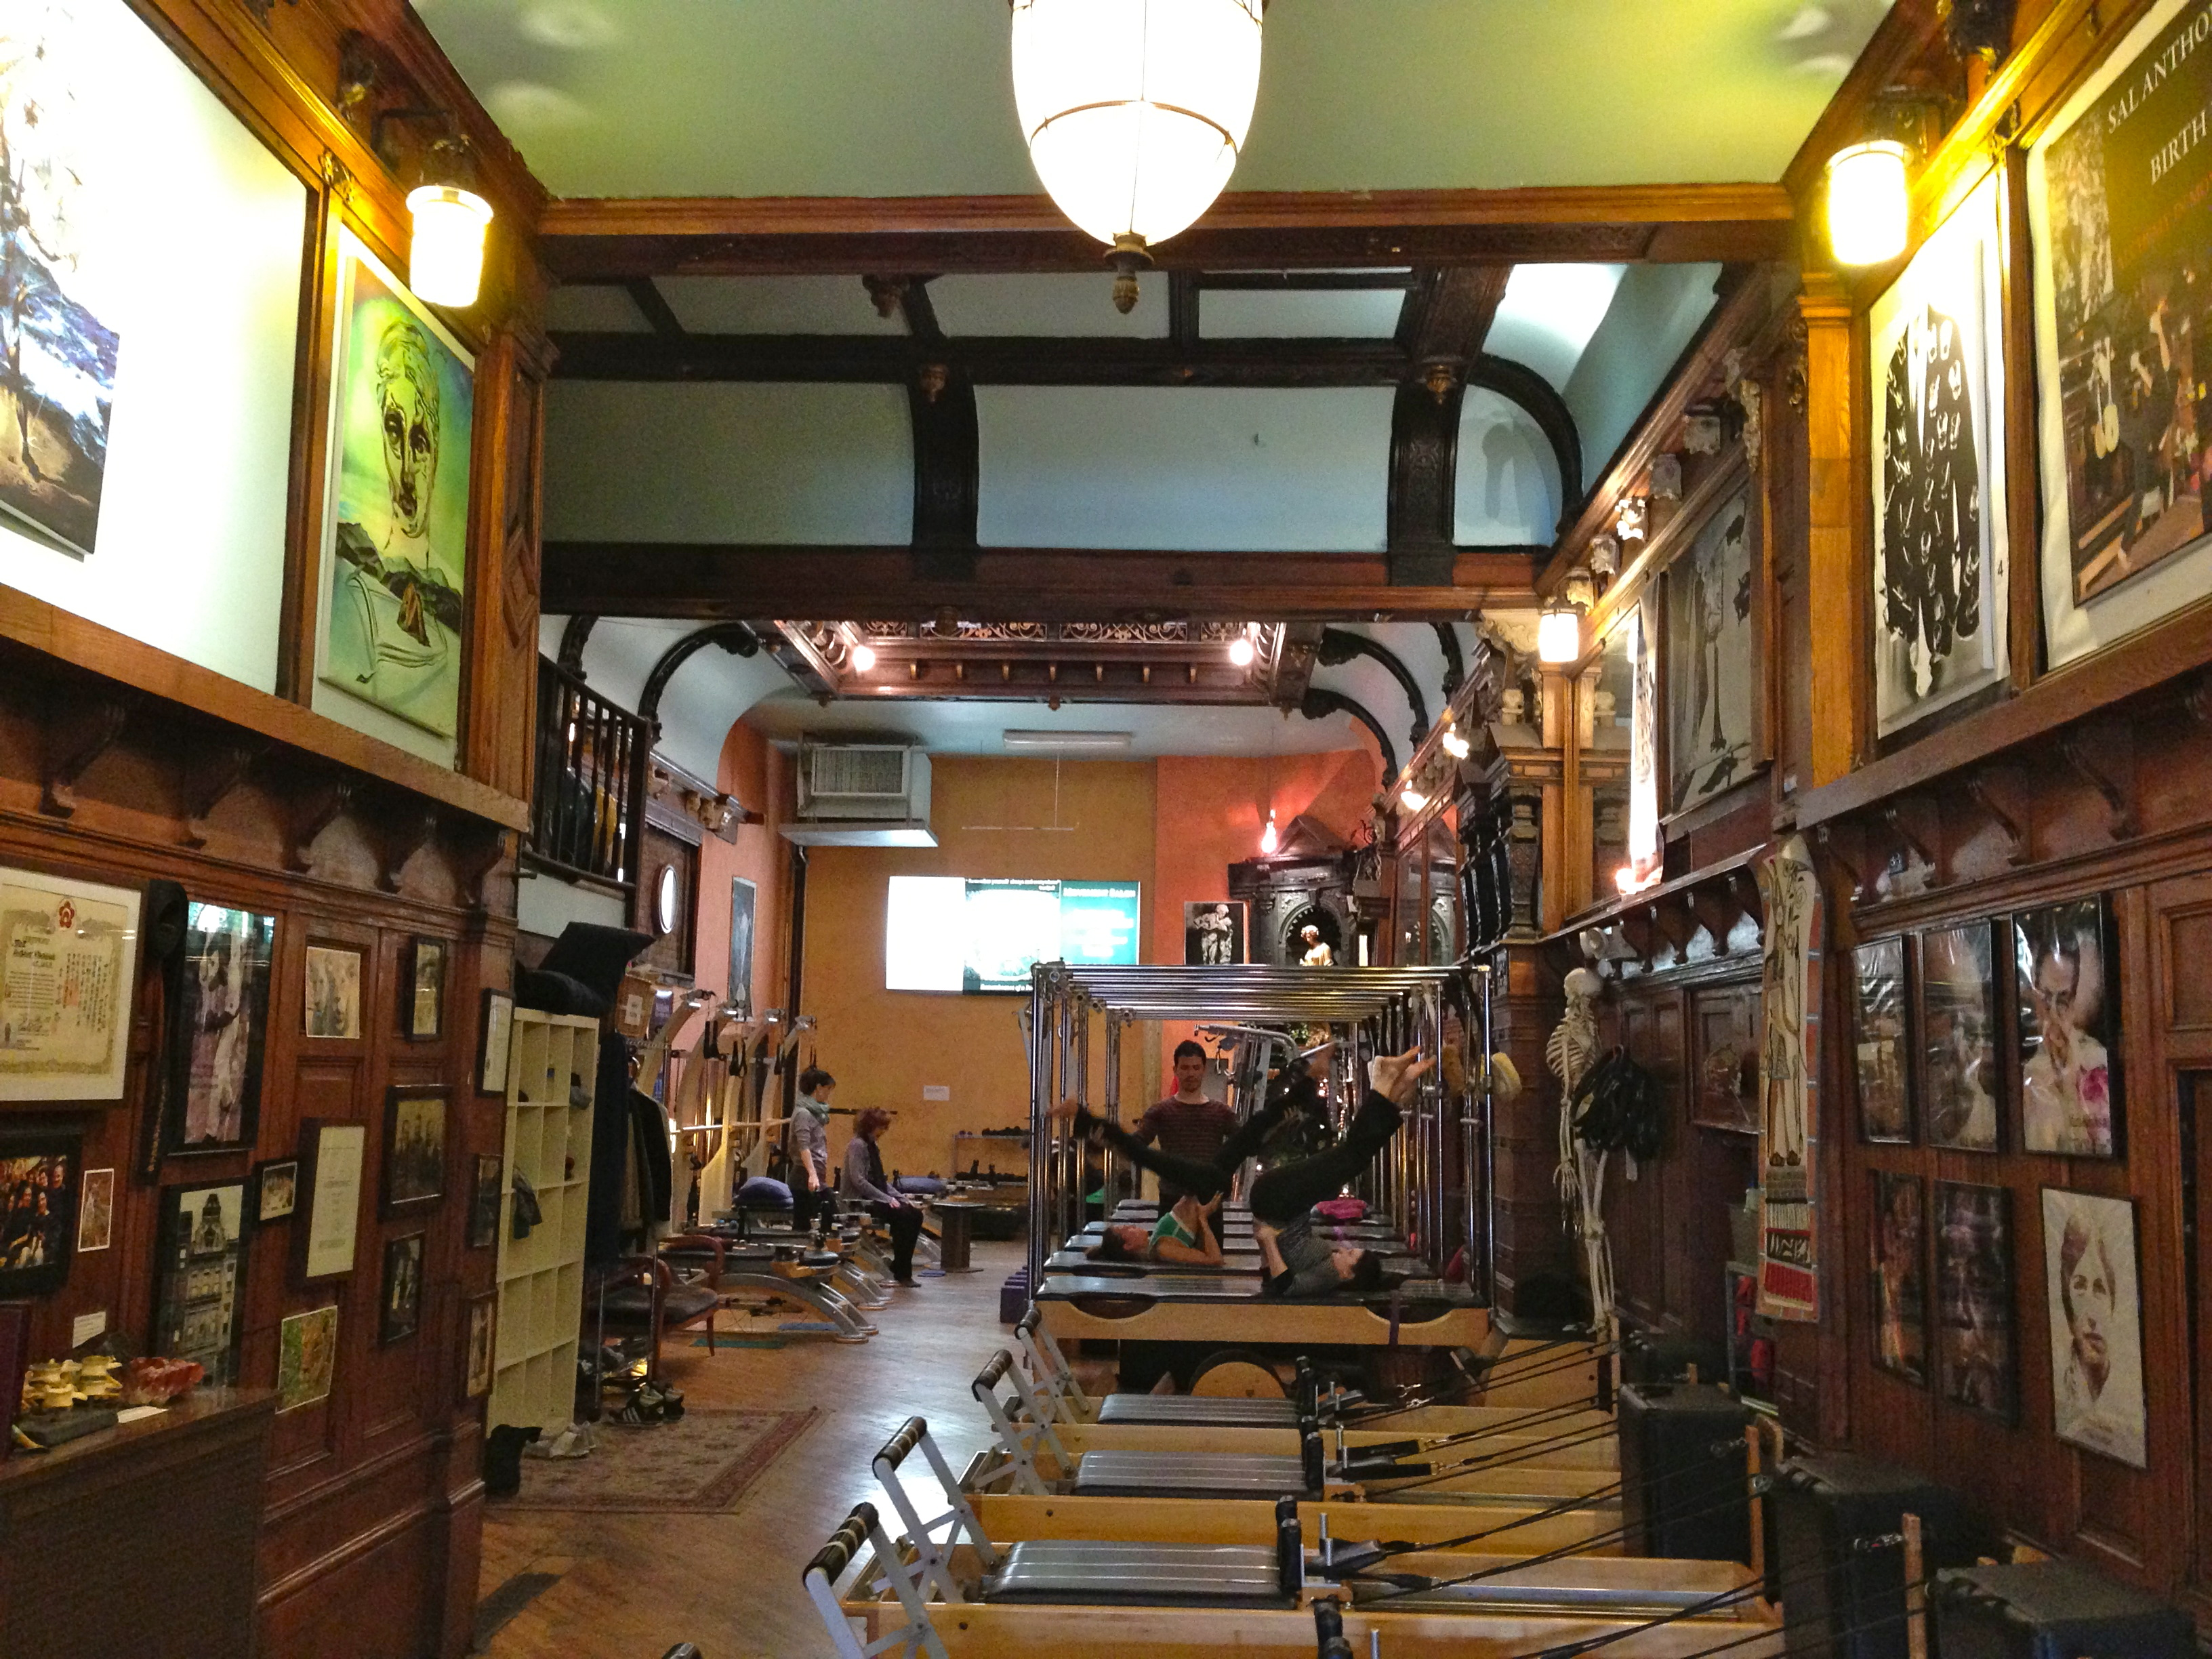 German beer halls New York City | Ephemeral New York